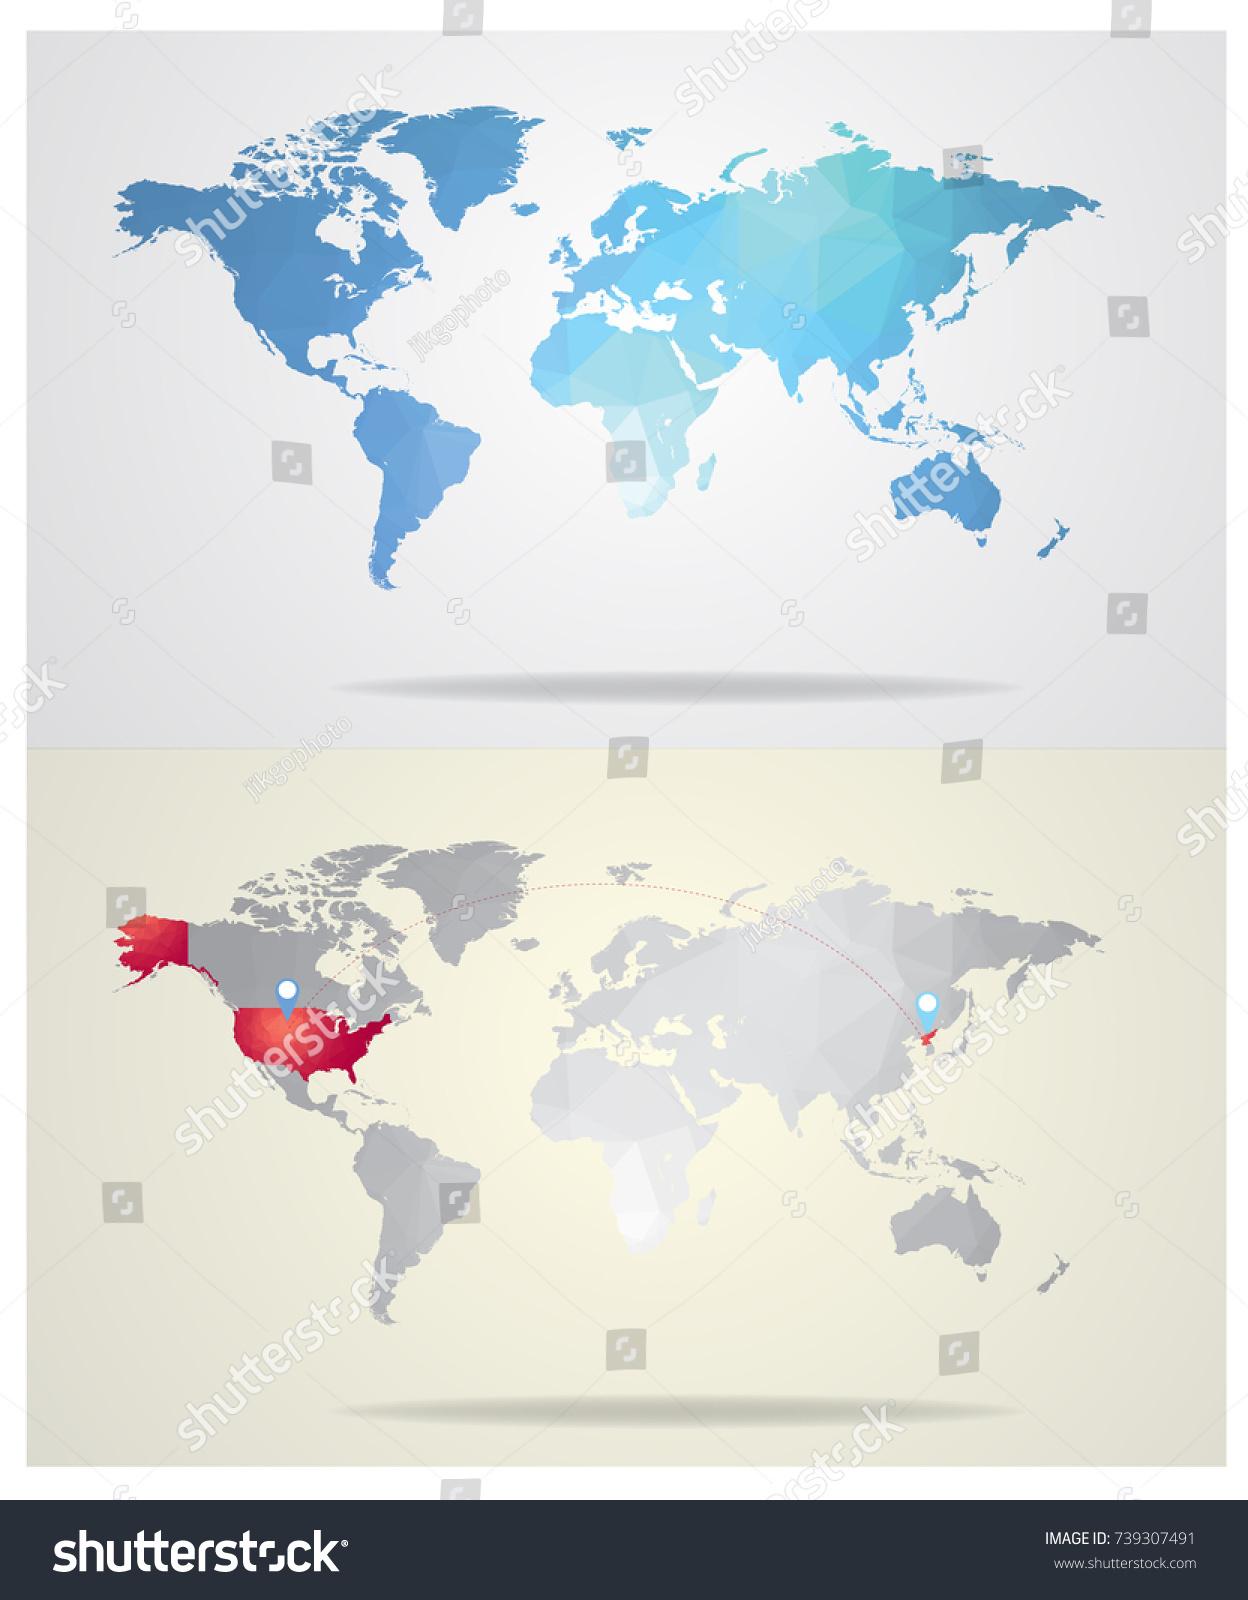 Blue world map gray world map stock vector 739307491 shutterstock gumiabroncs Images